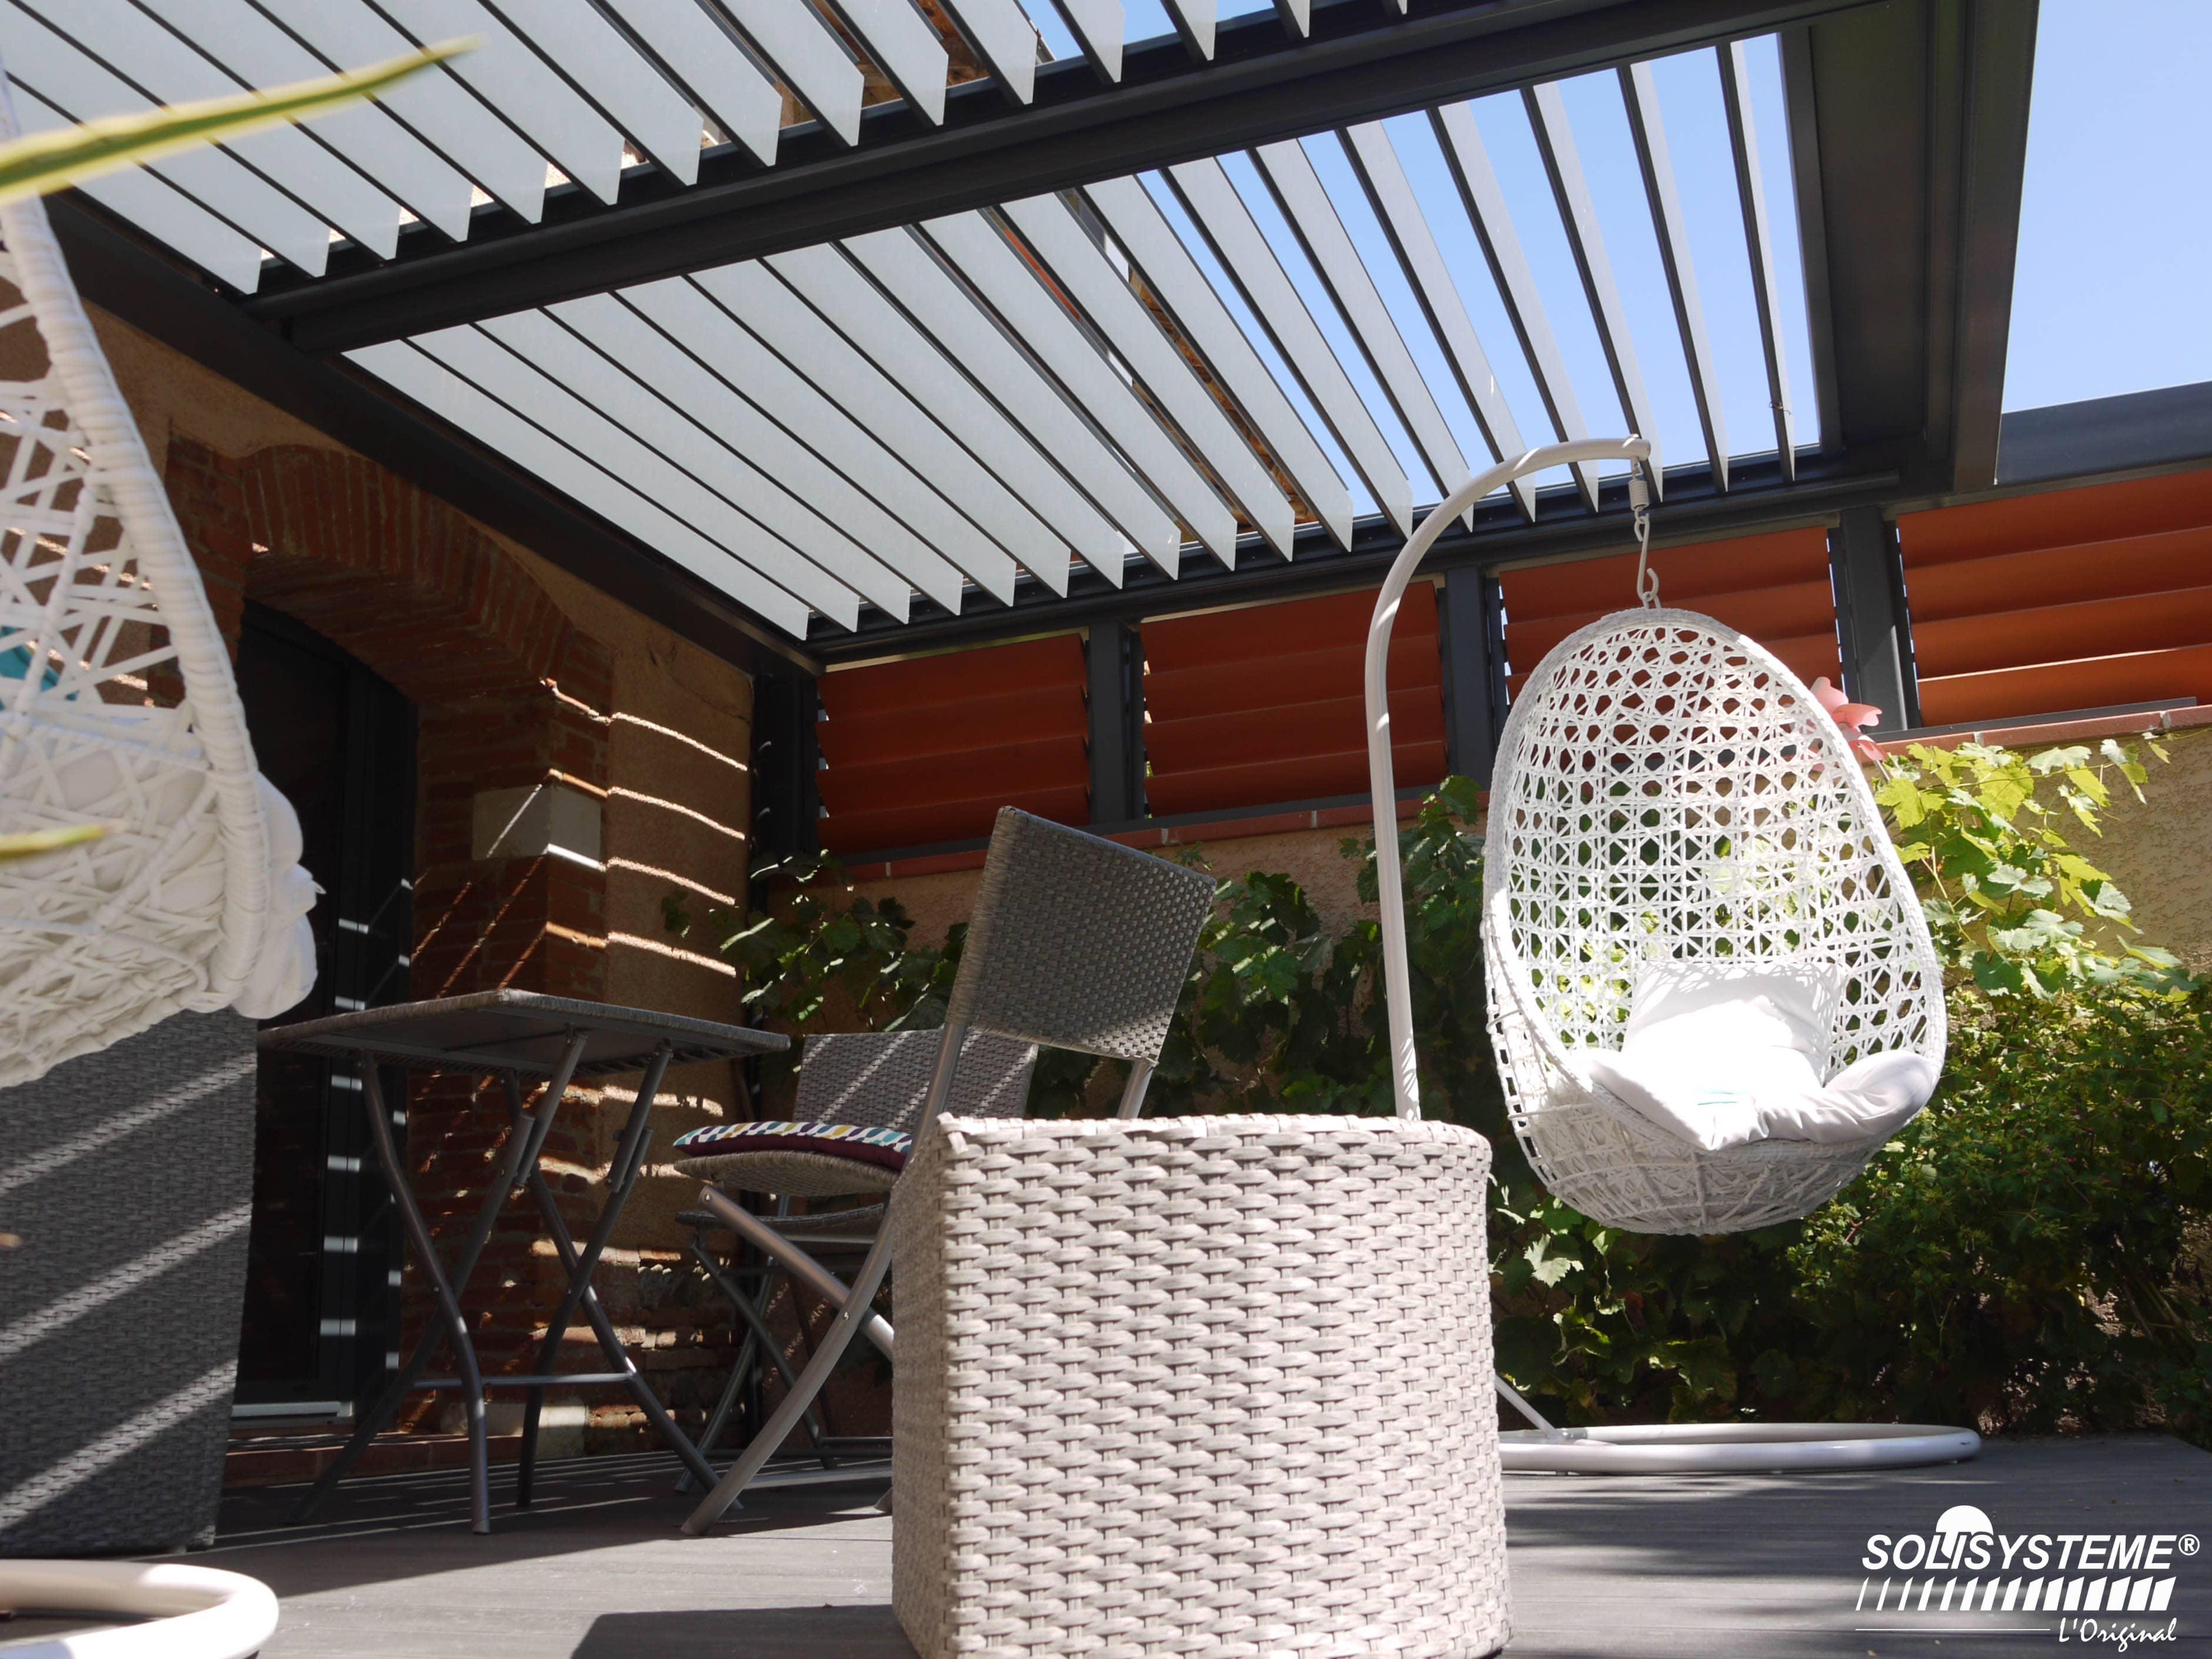 pergola bioclimatique solisysteme l innovation made in france ext rieurs design. Black Bedroom Furniture Sets. Home Design Ideas